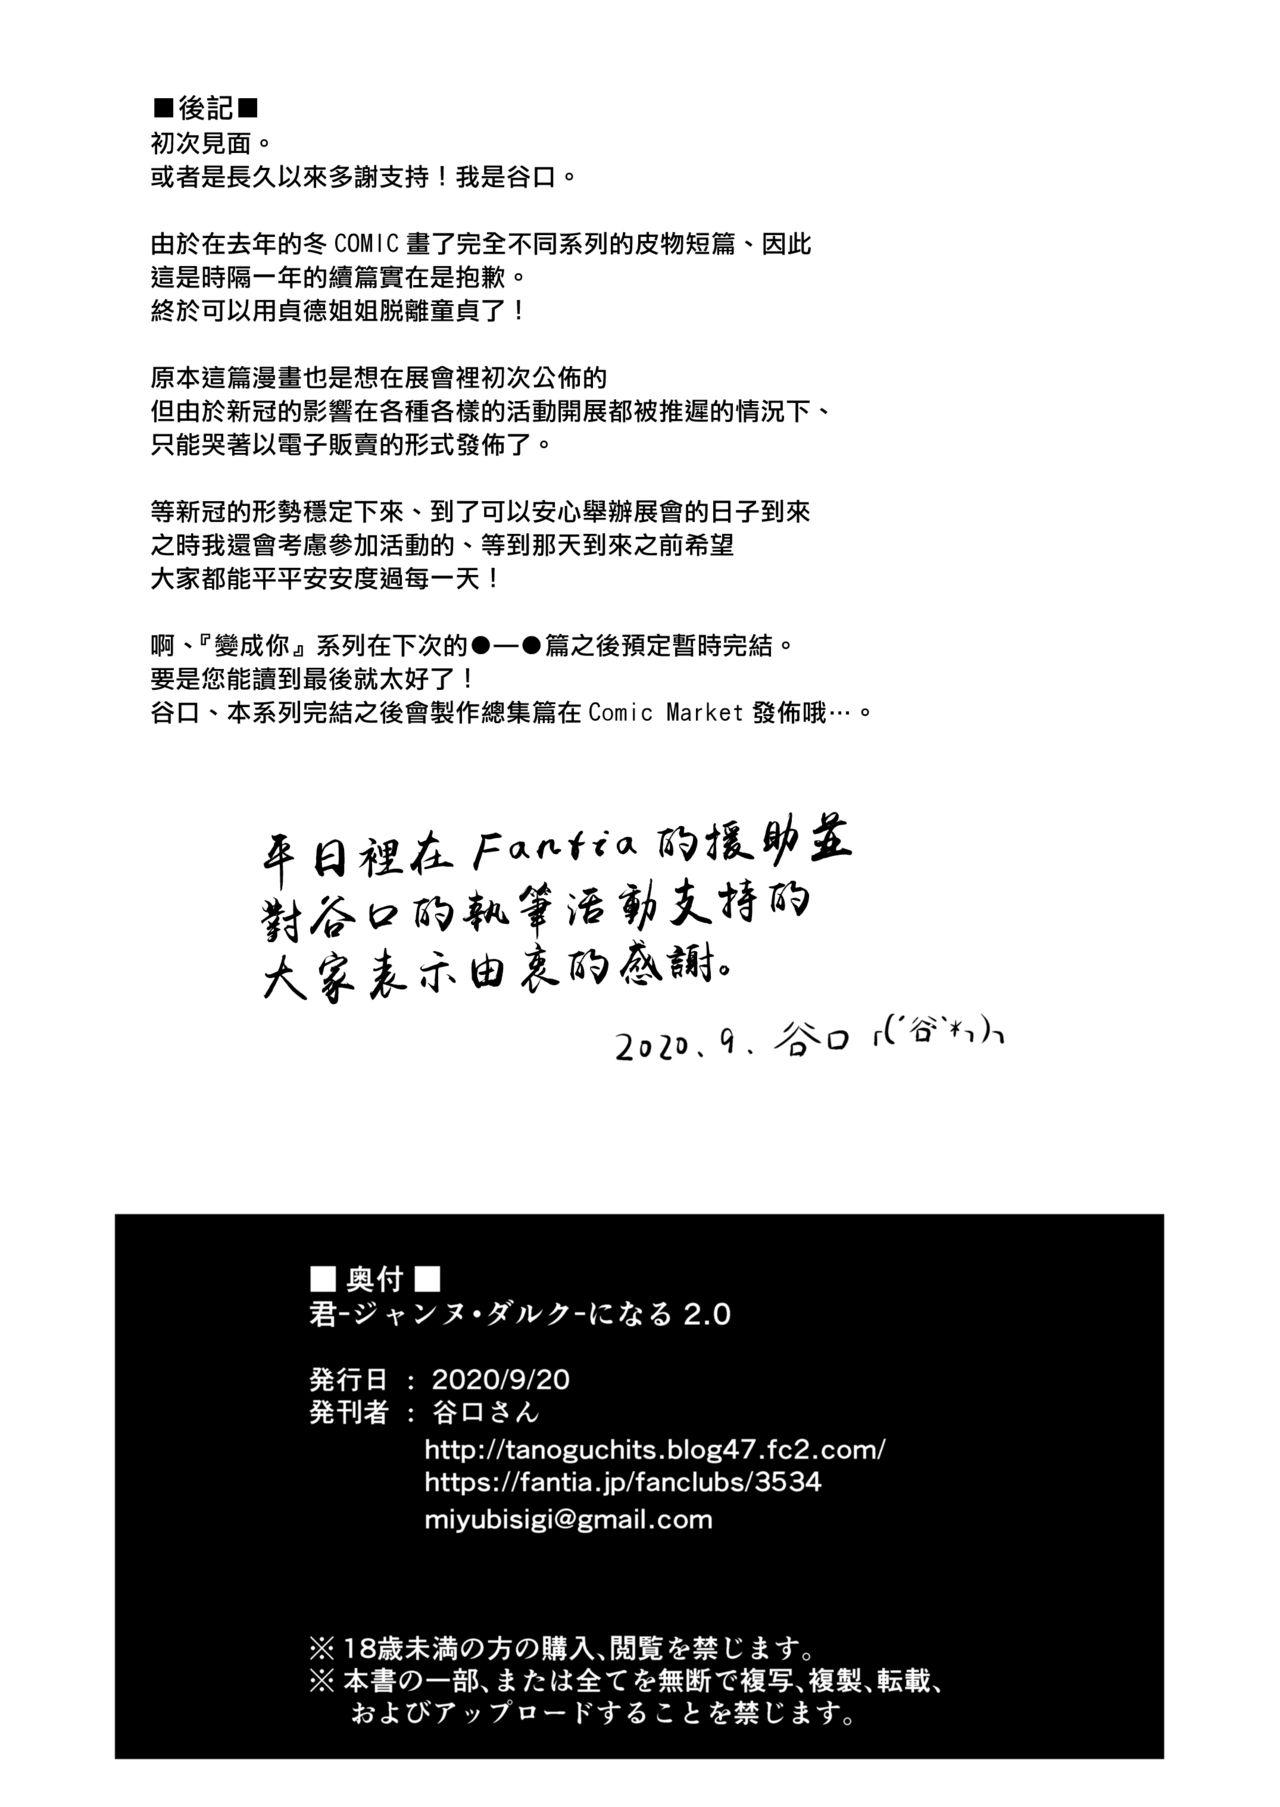 [Dschinghis Khan no Tamanegi wa Ore no Yome (Taniguchi-san)] Kimi -Jeanne d'Arc- ni Naru 2 (Fate/Grand Order) [Chinese] [熊崎玉子汉化组] [Digital] 24